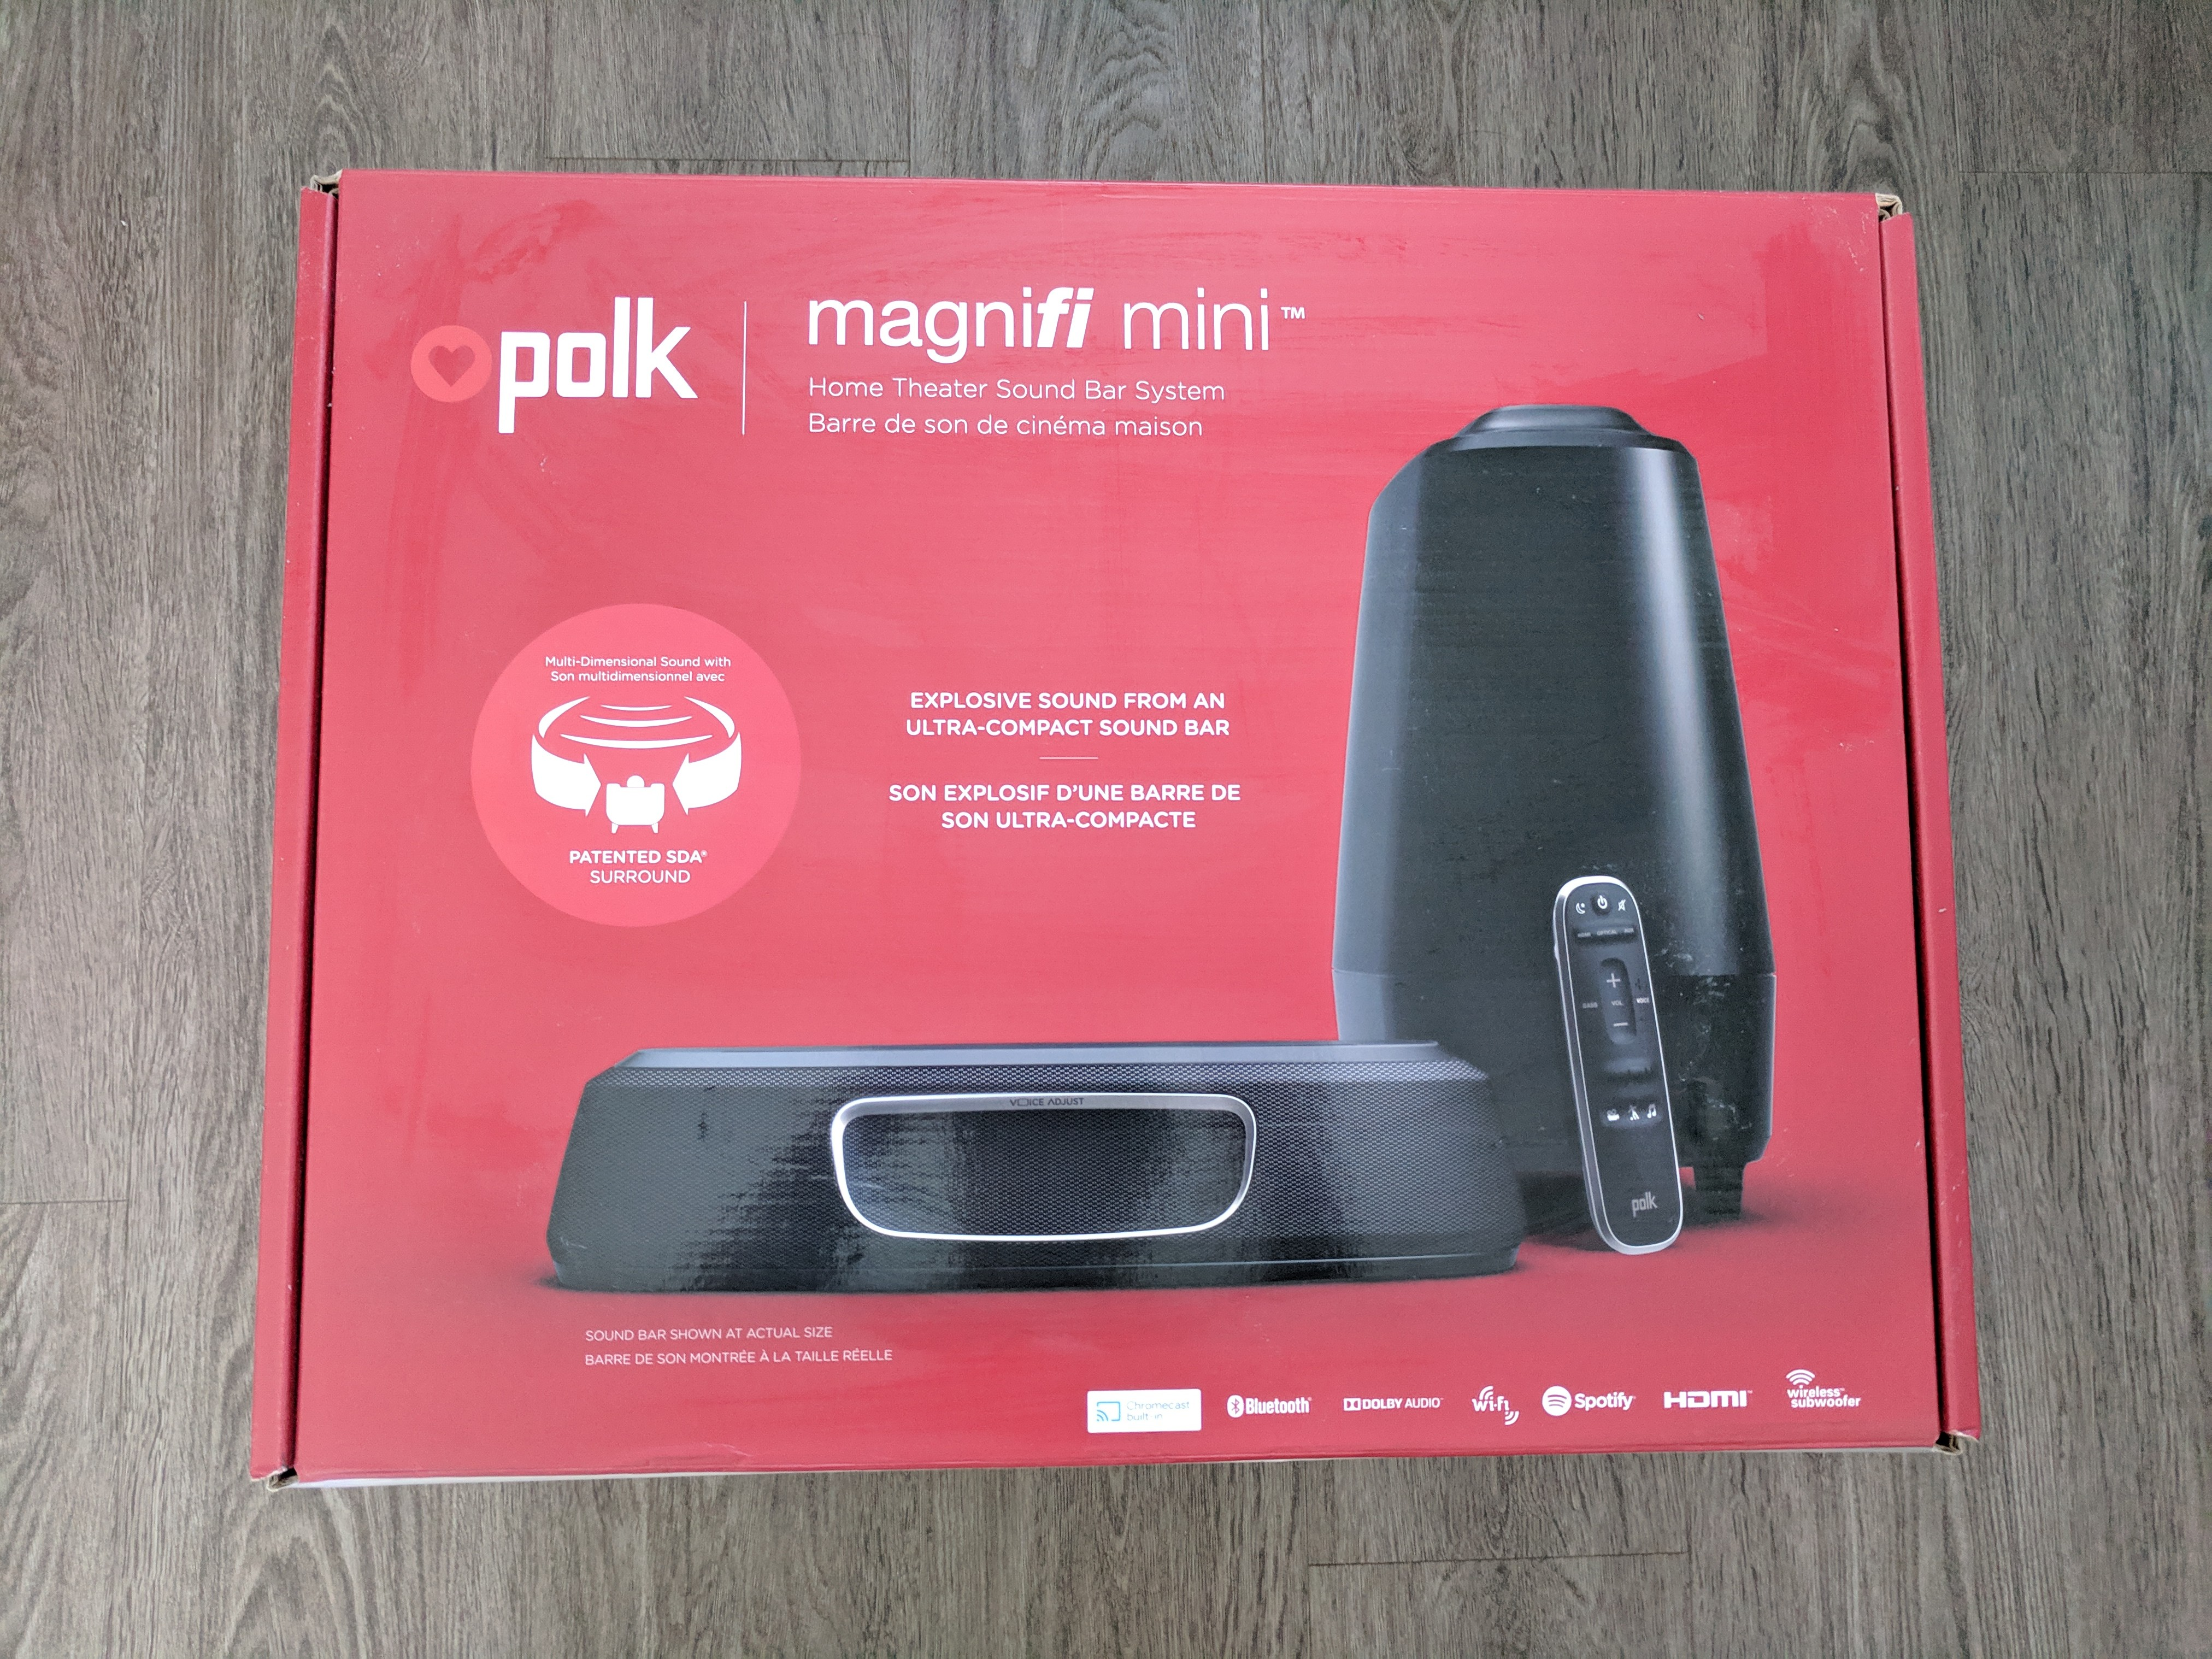 Brand new Polk Magnifi mini, Electronics, Audio on Carousell